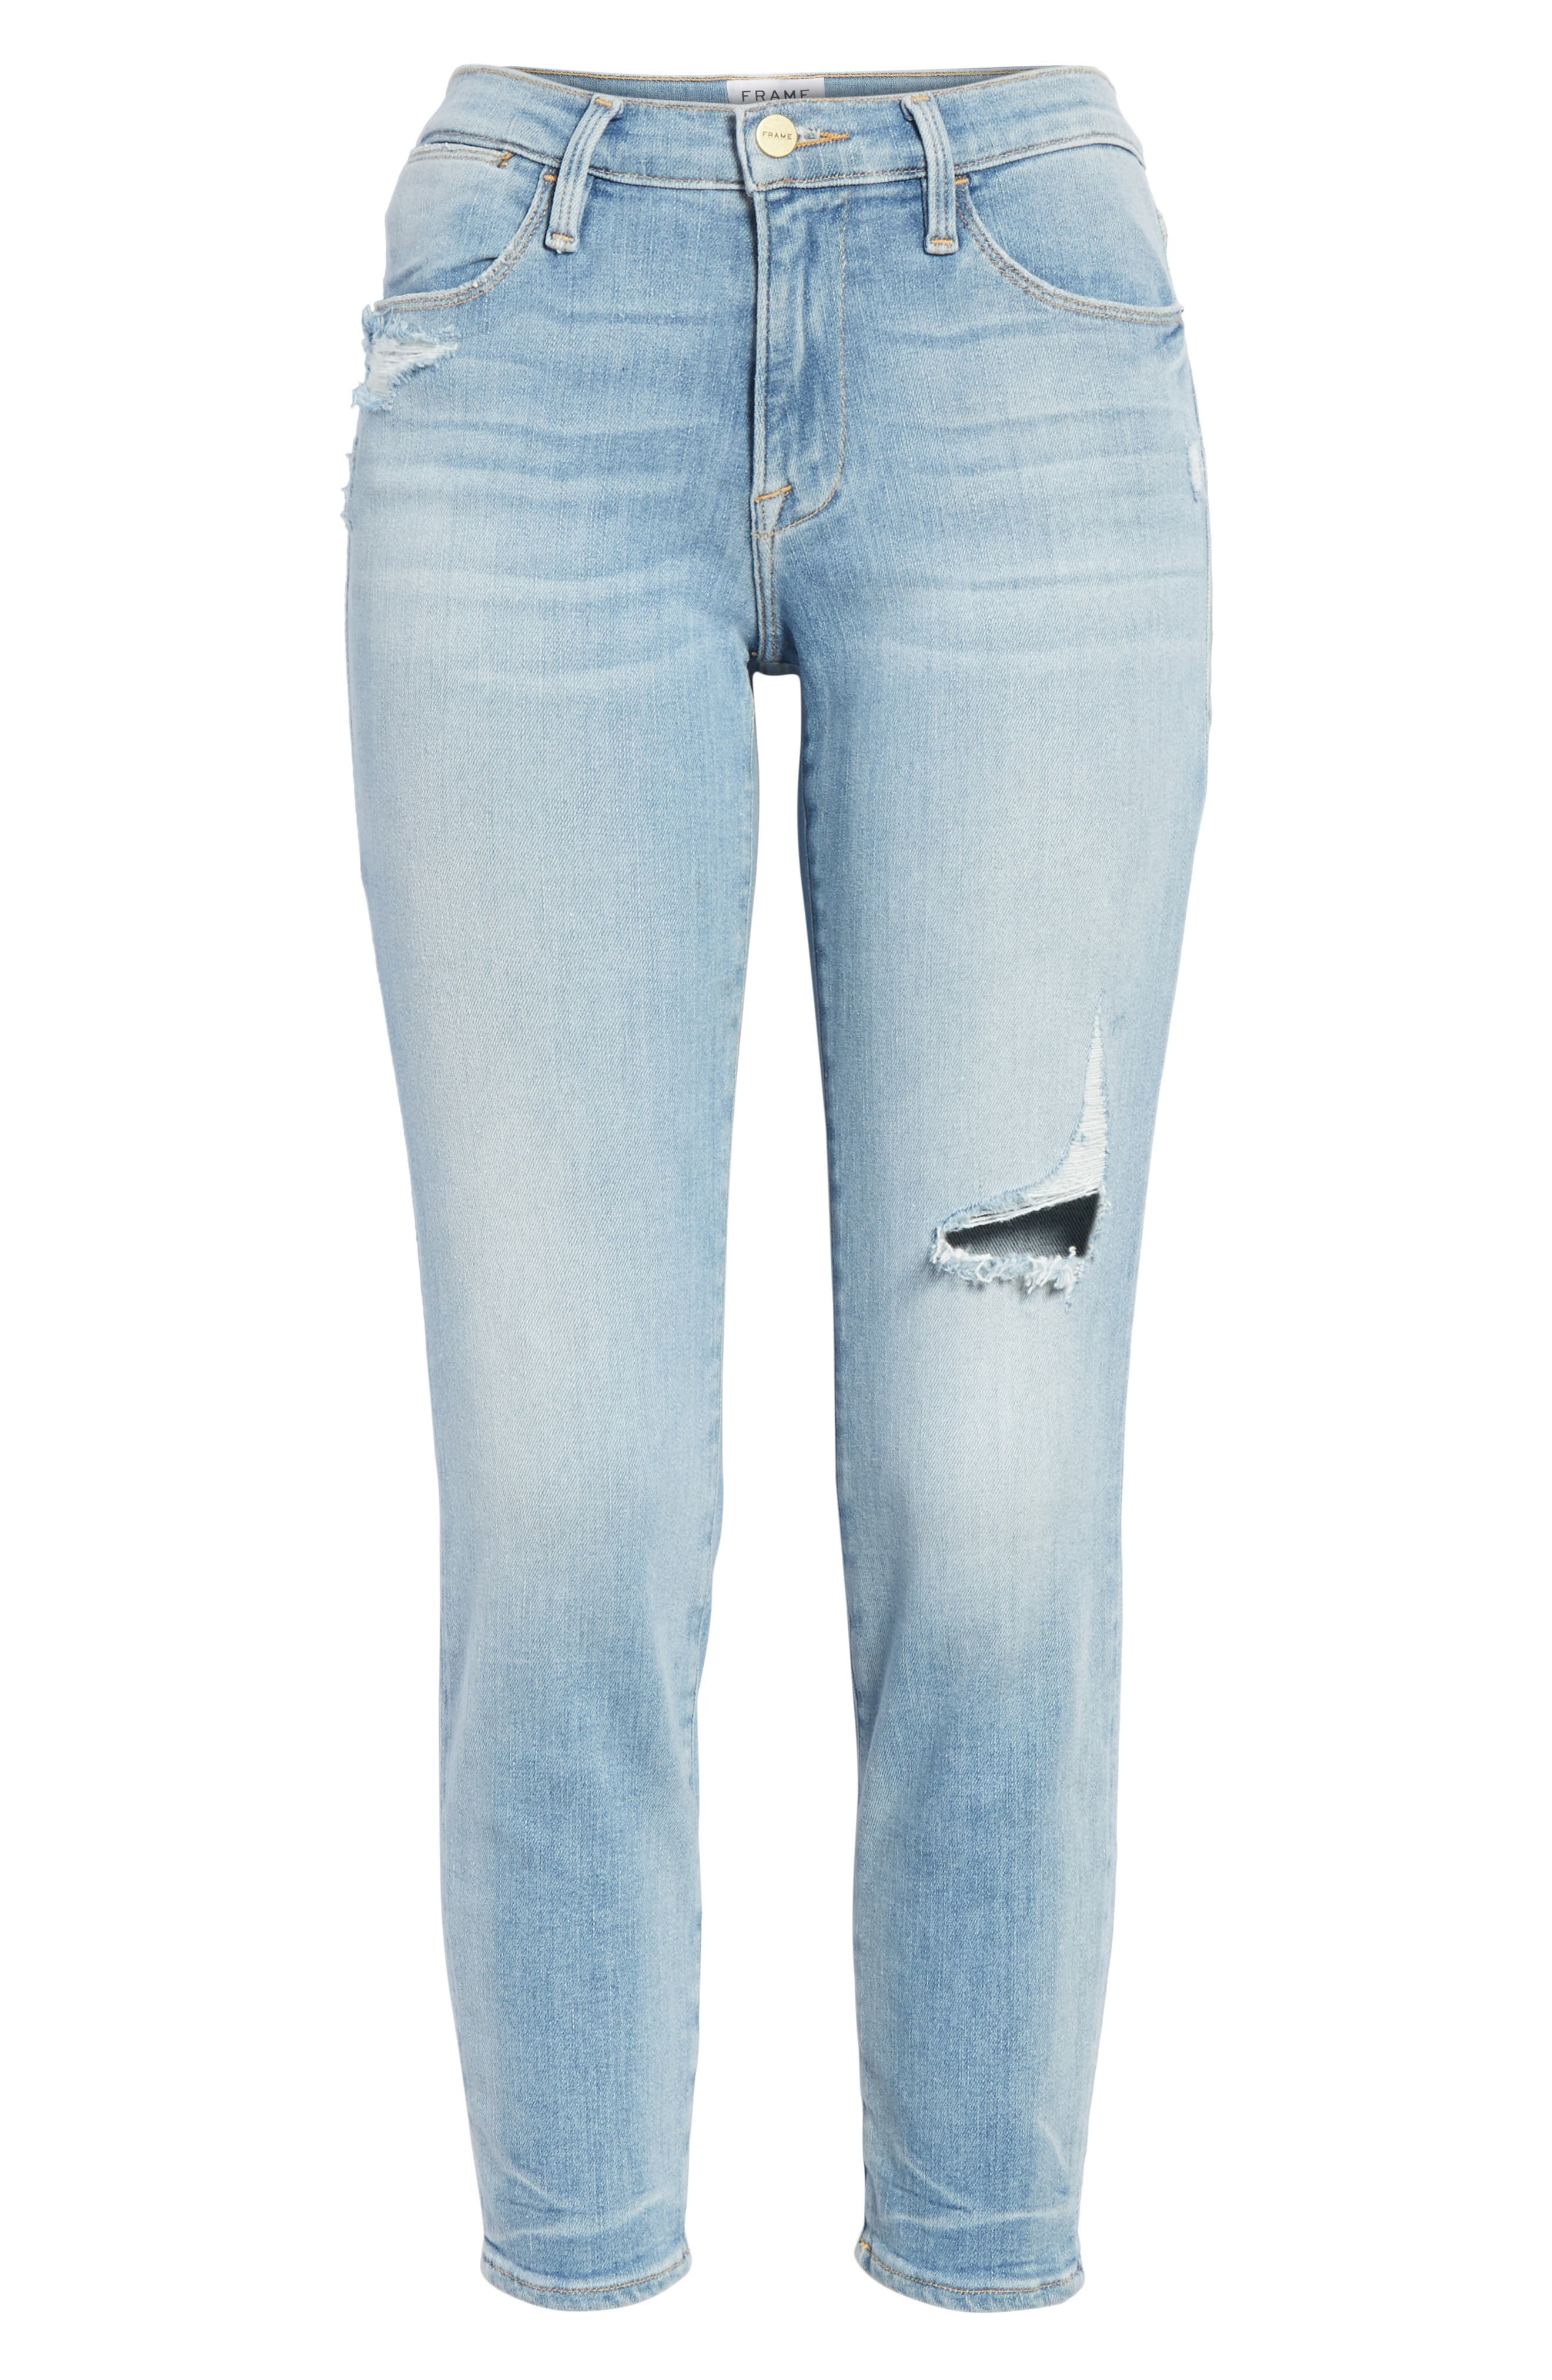 Le High Skinny Jeans,                             Alternate thumbnail 6, color,                             450